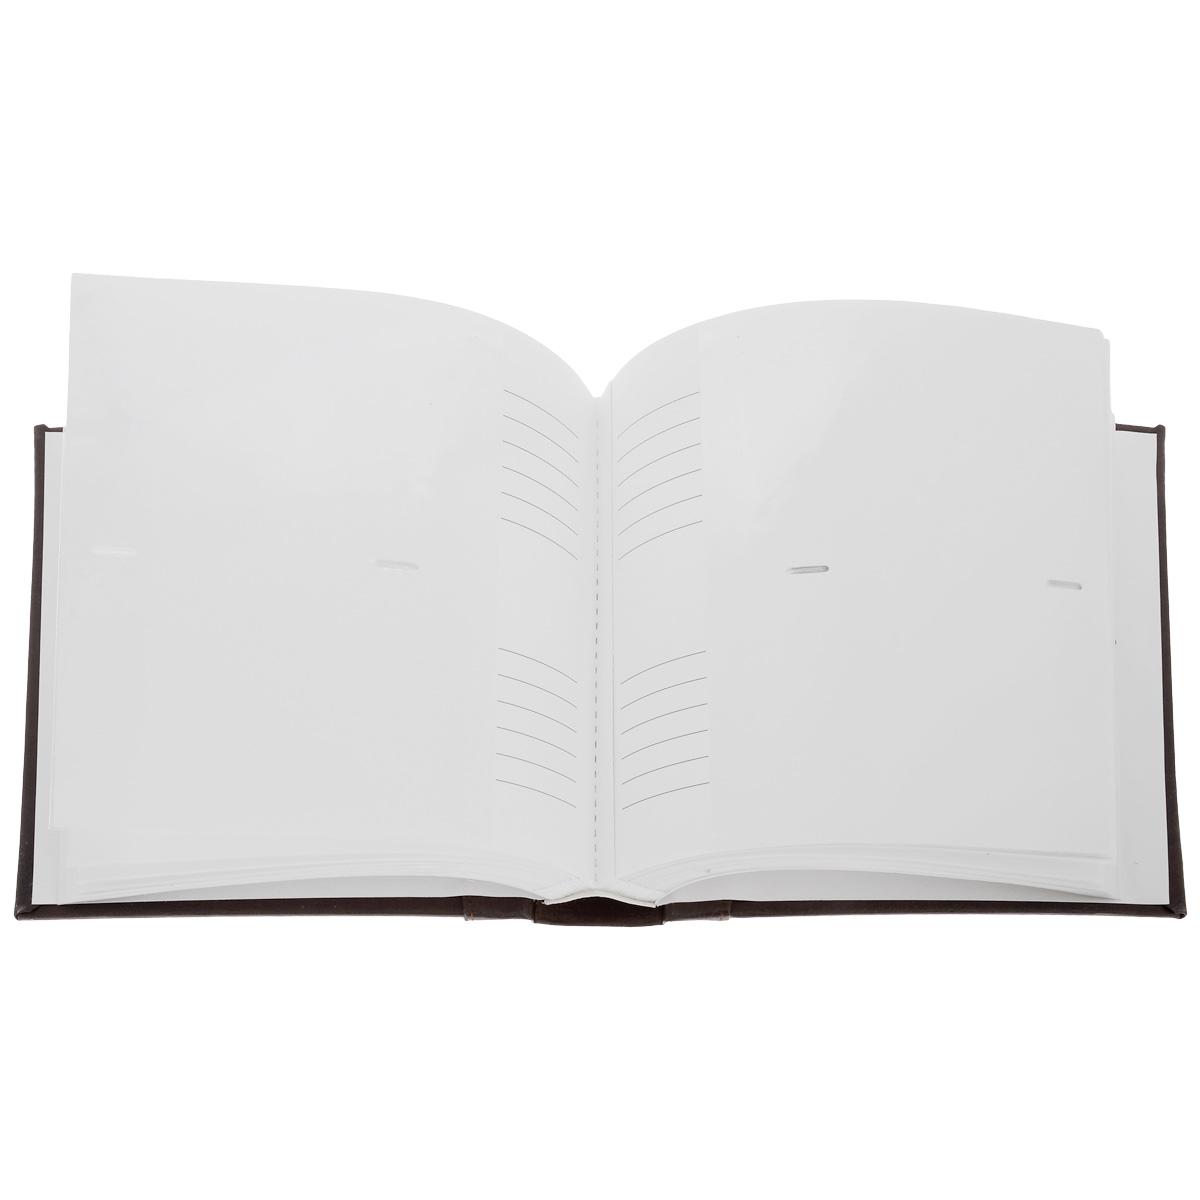 "Фотоальбом Image Art ""Классика"", 200 фотографий, 10 x 15 см, цвет: баклажан"